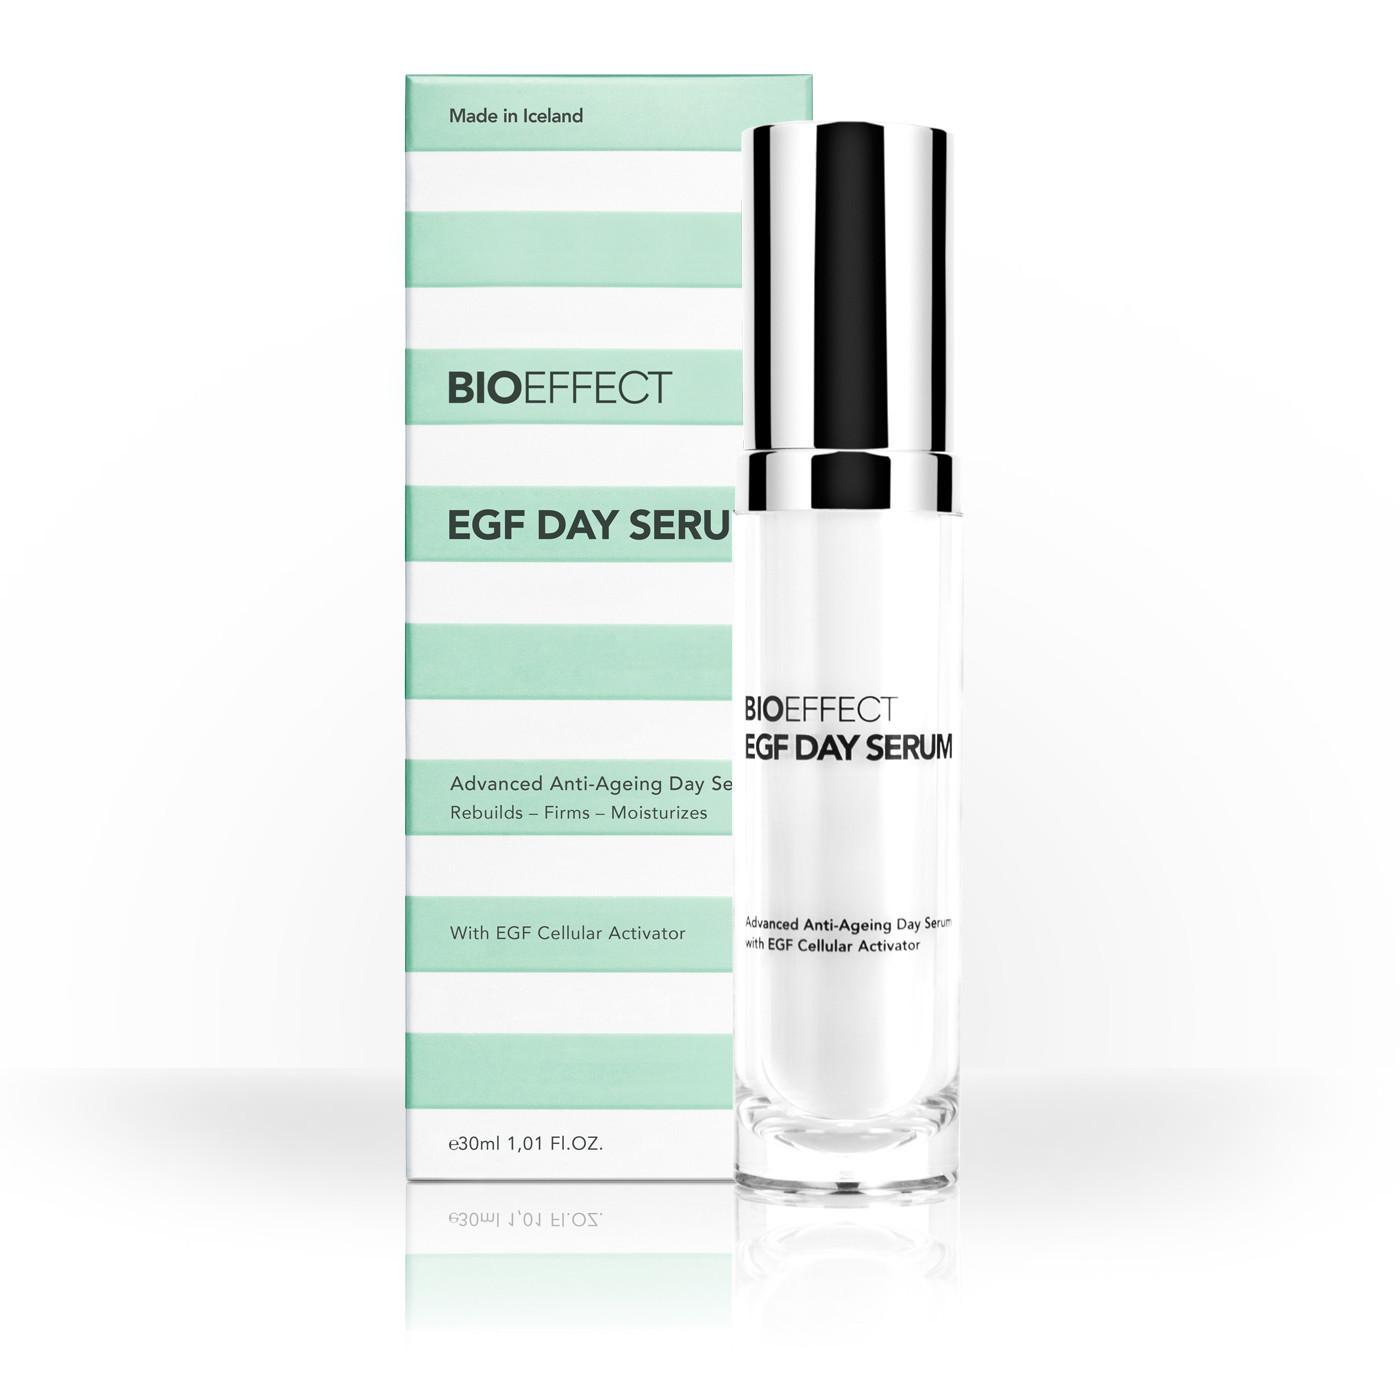 bioeffect egf serum how to use